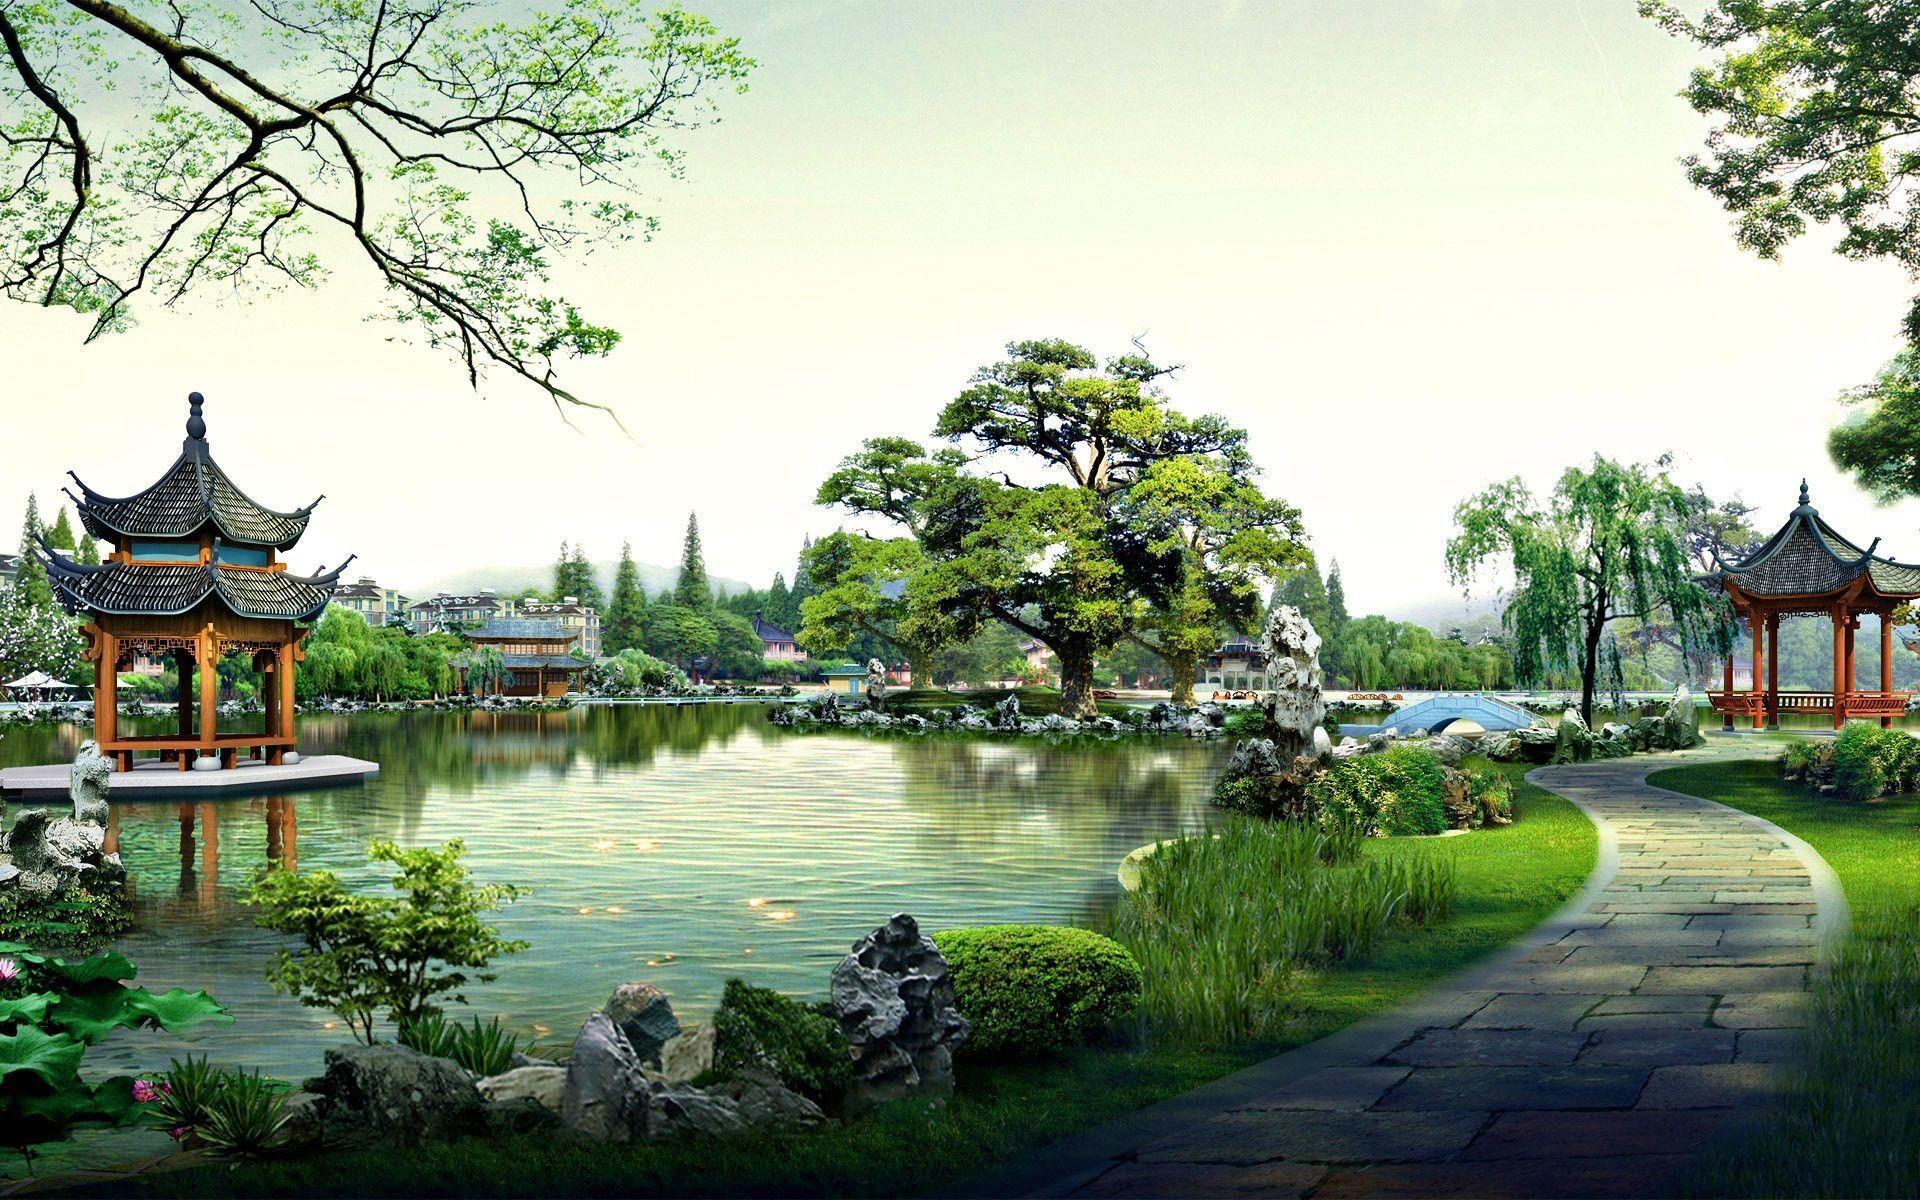 China Desktop Wallpaper 76 Images